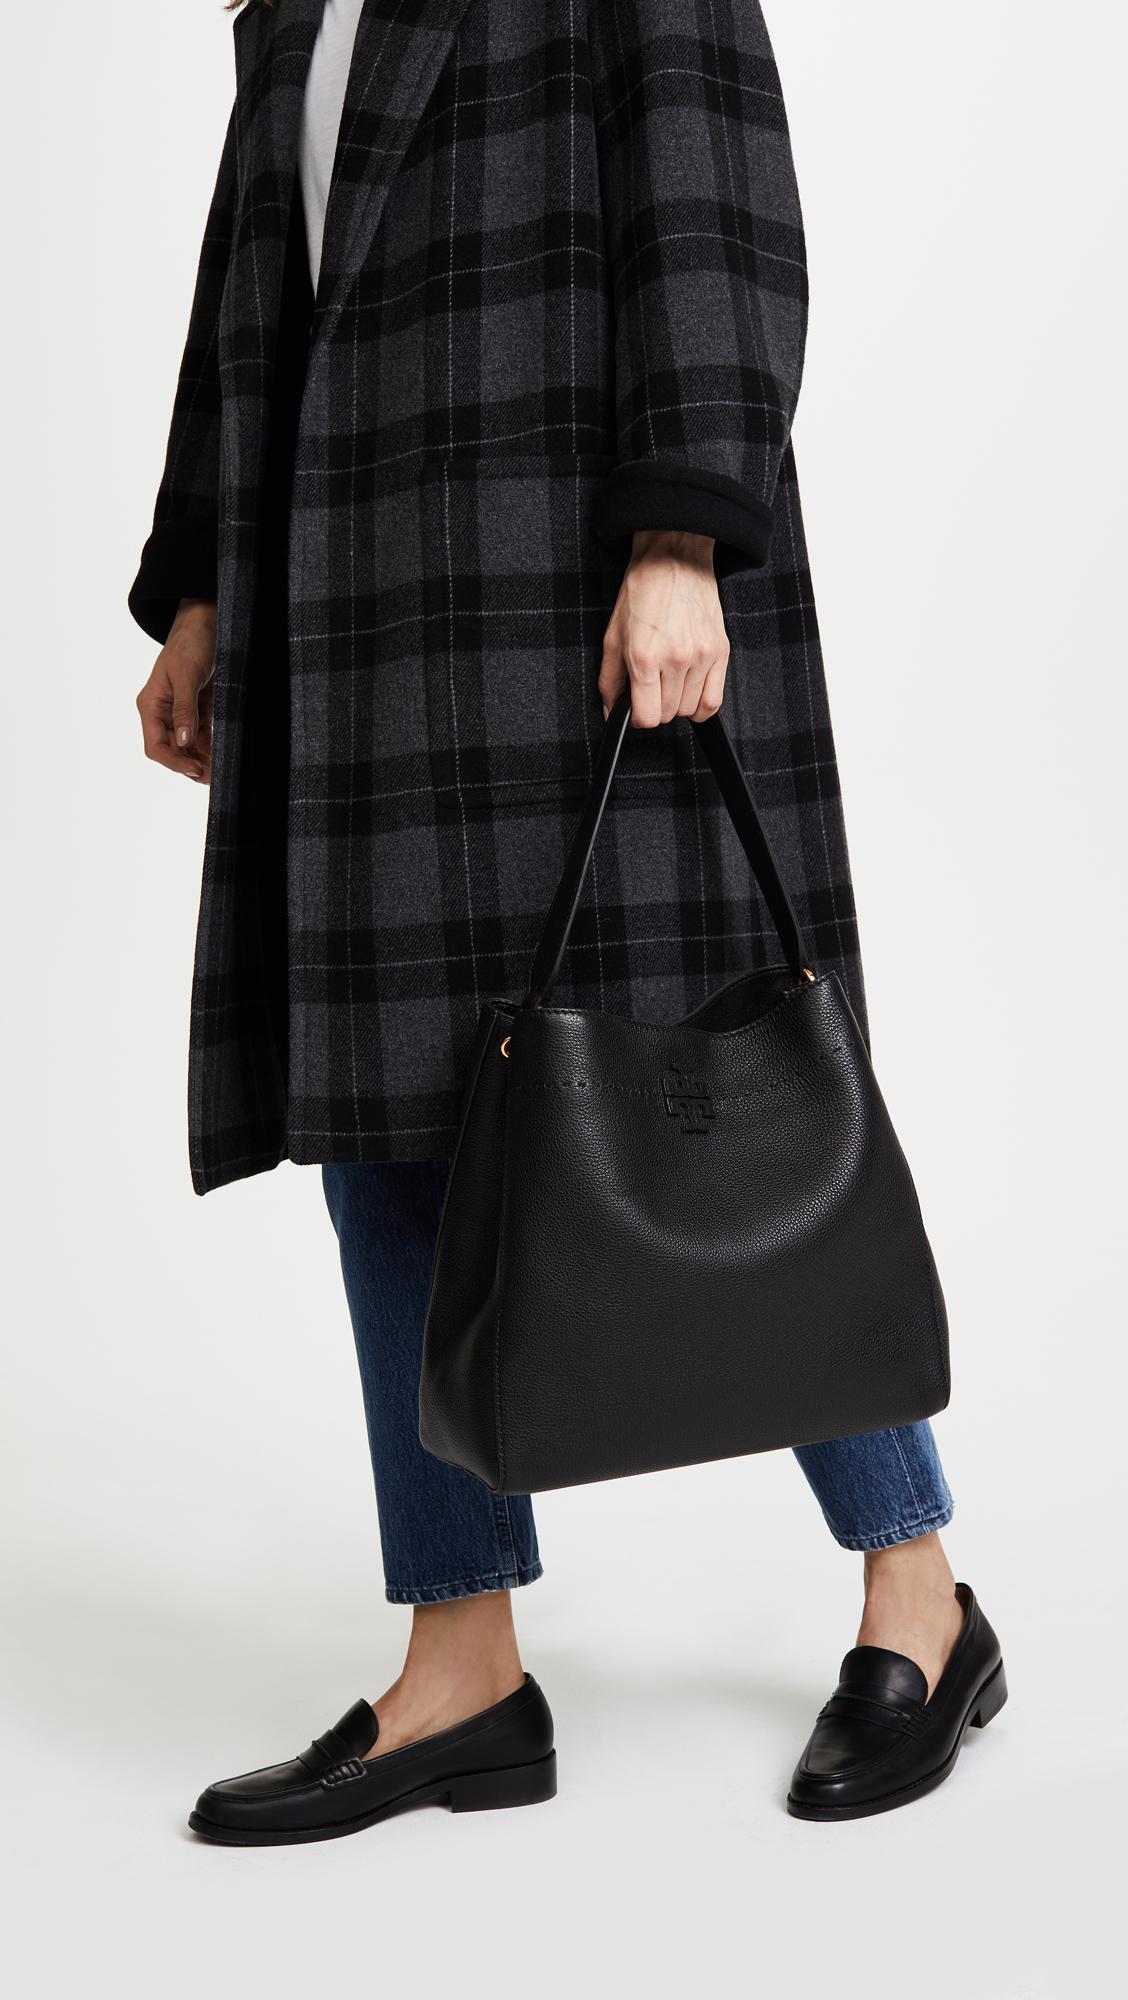 7b550ad1f463 Lyst - Tory Burch Mcgraw Hobo Bag in Black